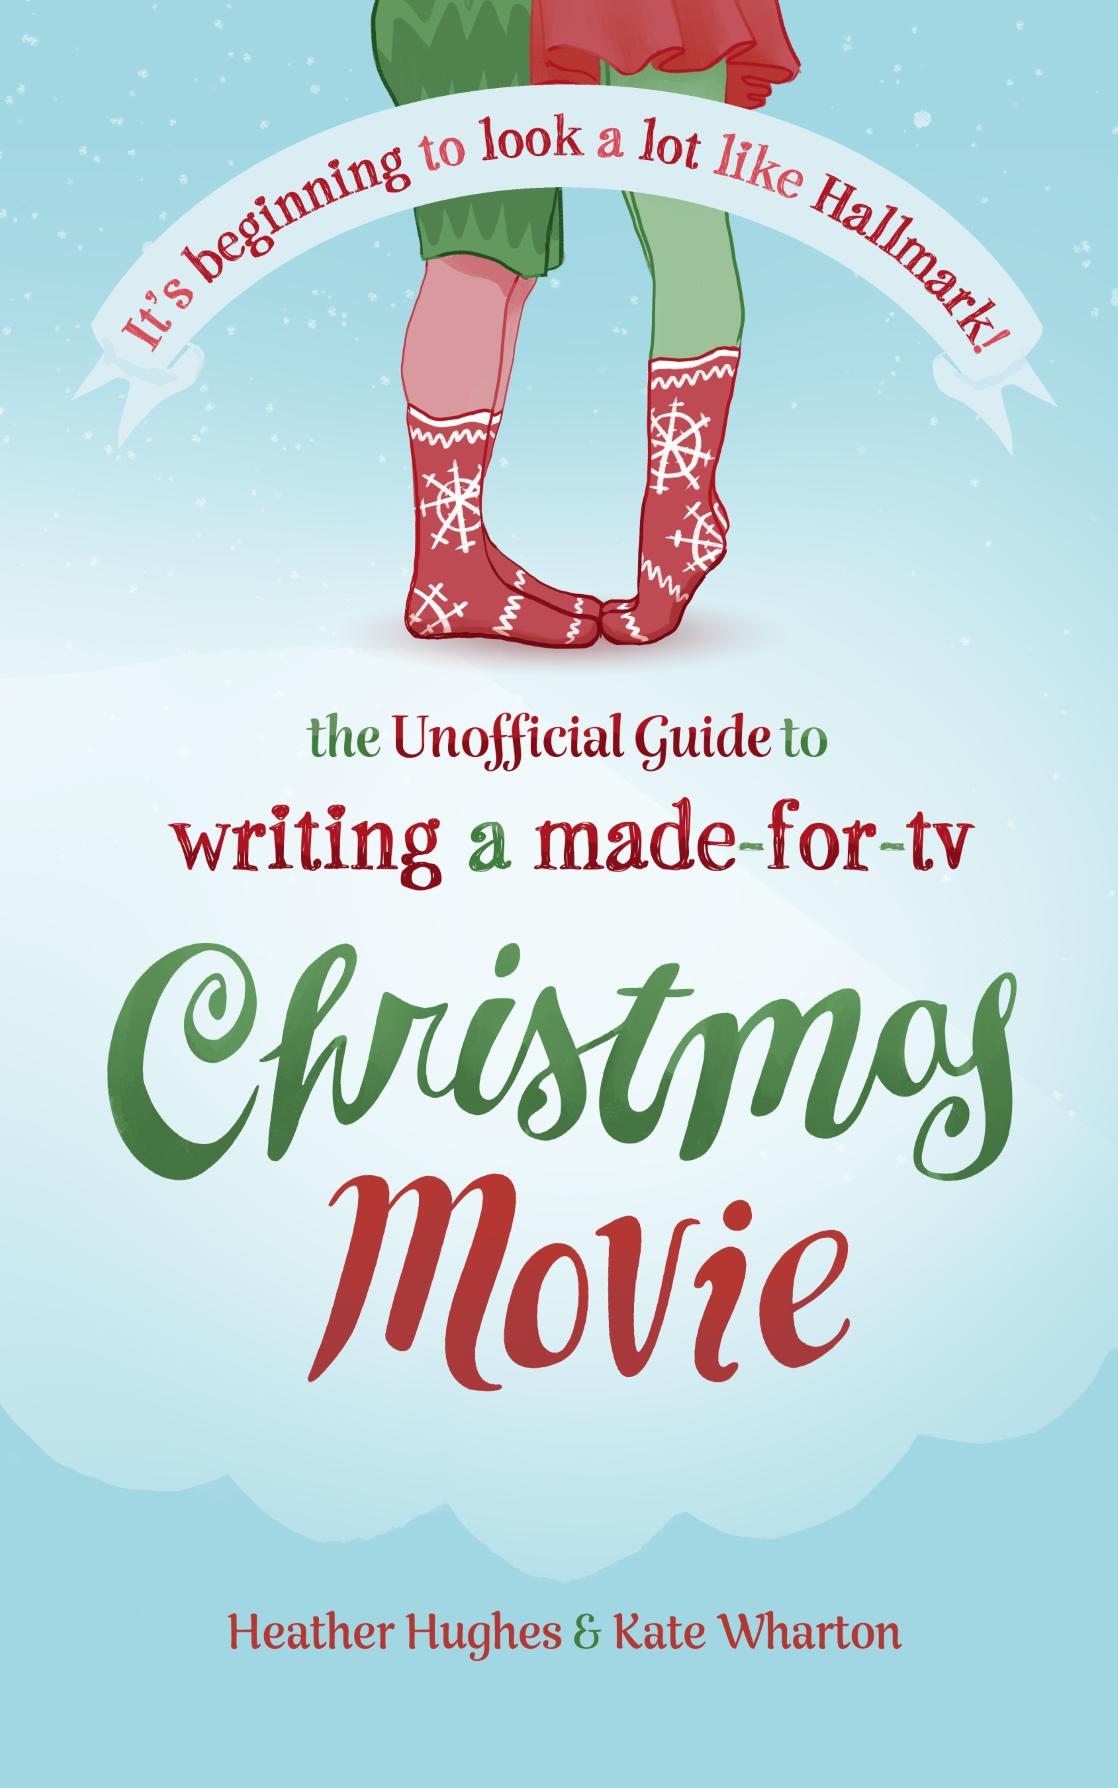 I Bet You Can 4e : Beginning, Hallmark!, Writing, Made-for-TV, Christmas, Movie, Movies,, Hallmark